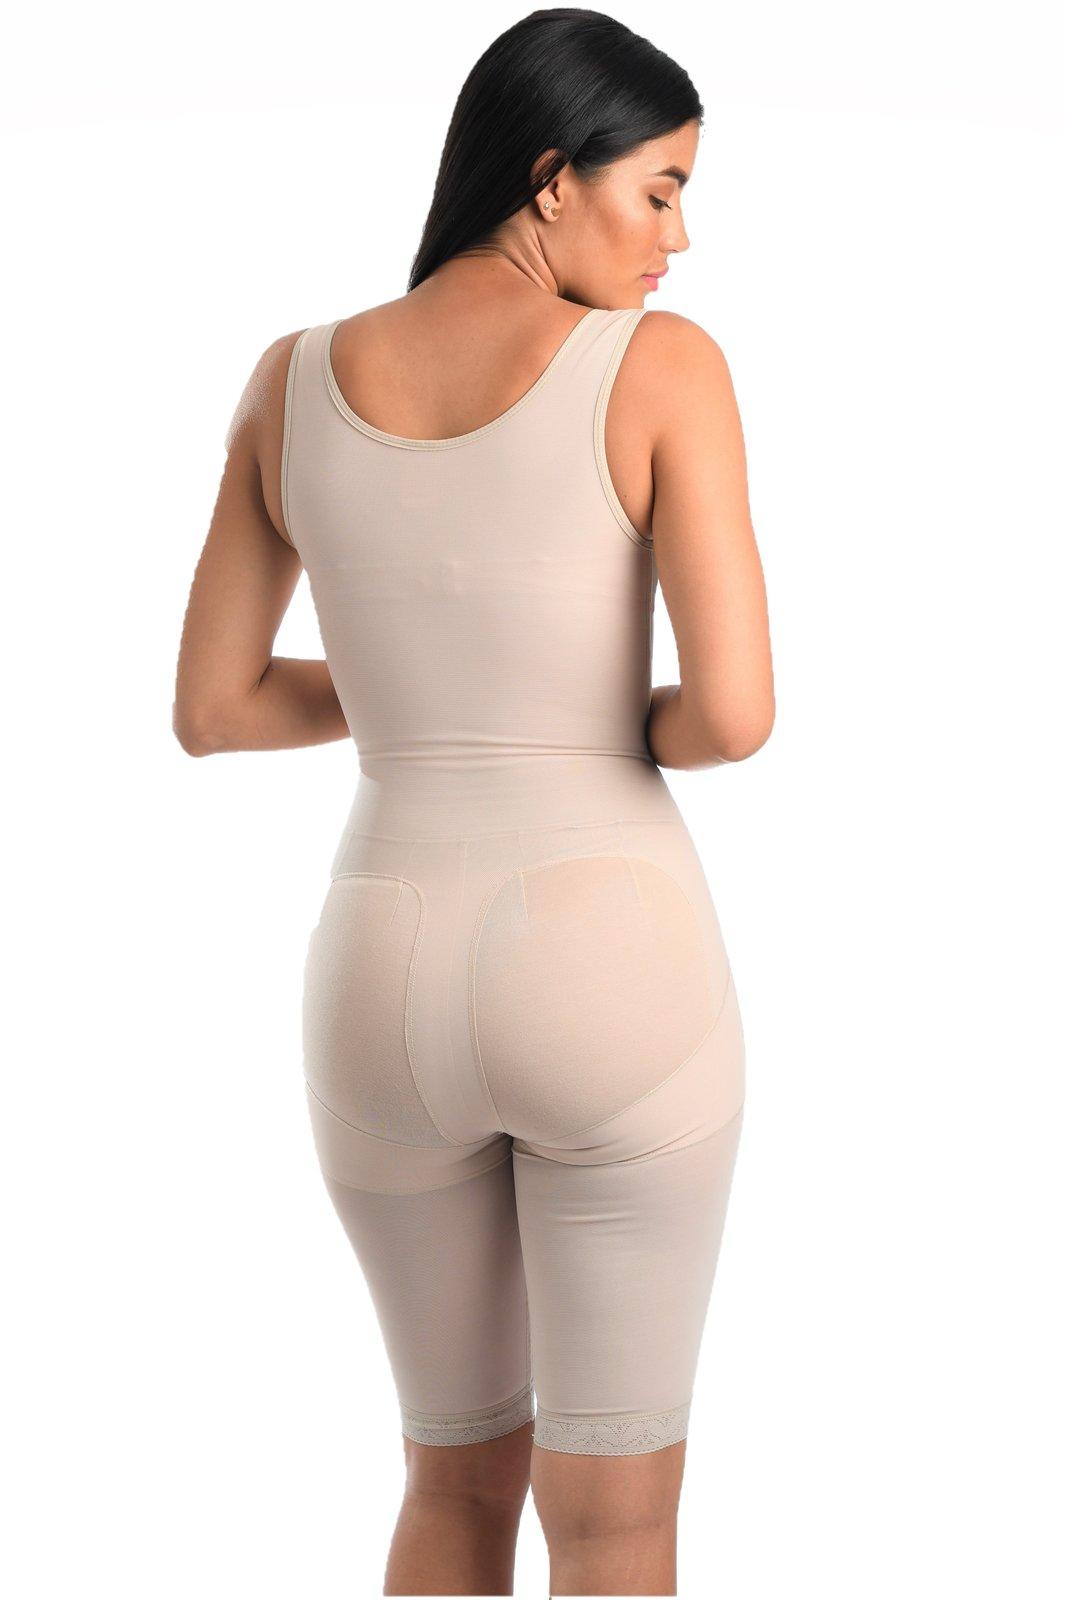 Shapewear - Liposuction Buttocks Lifter - Recovery Girdle - $81.99